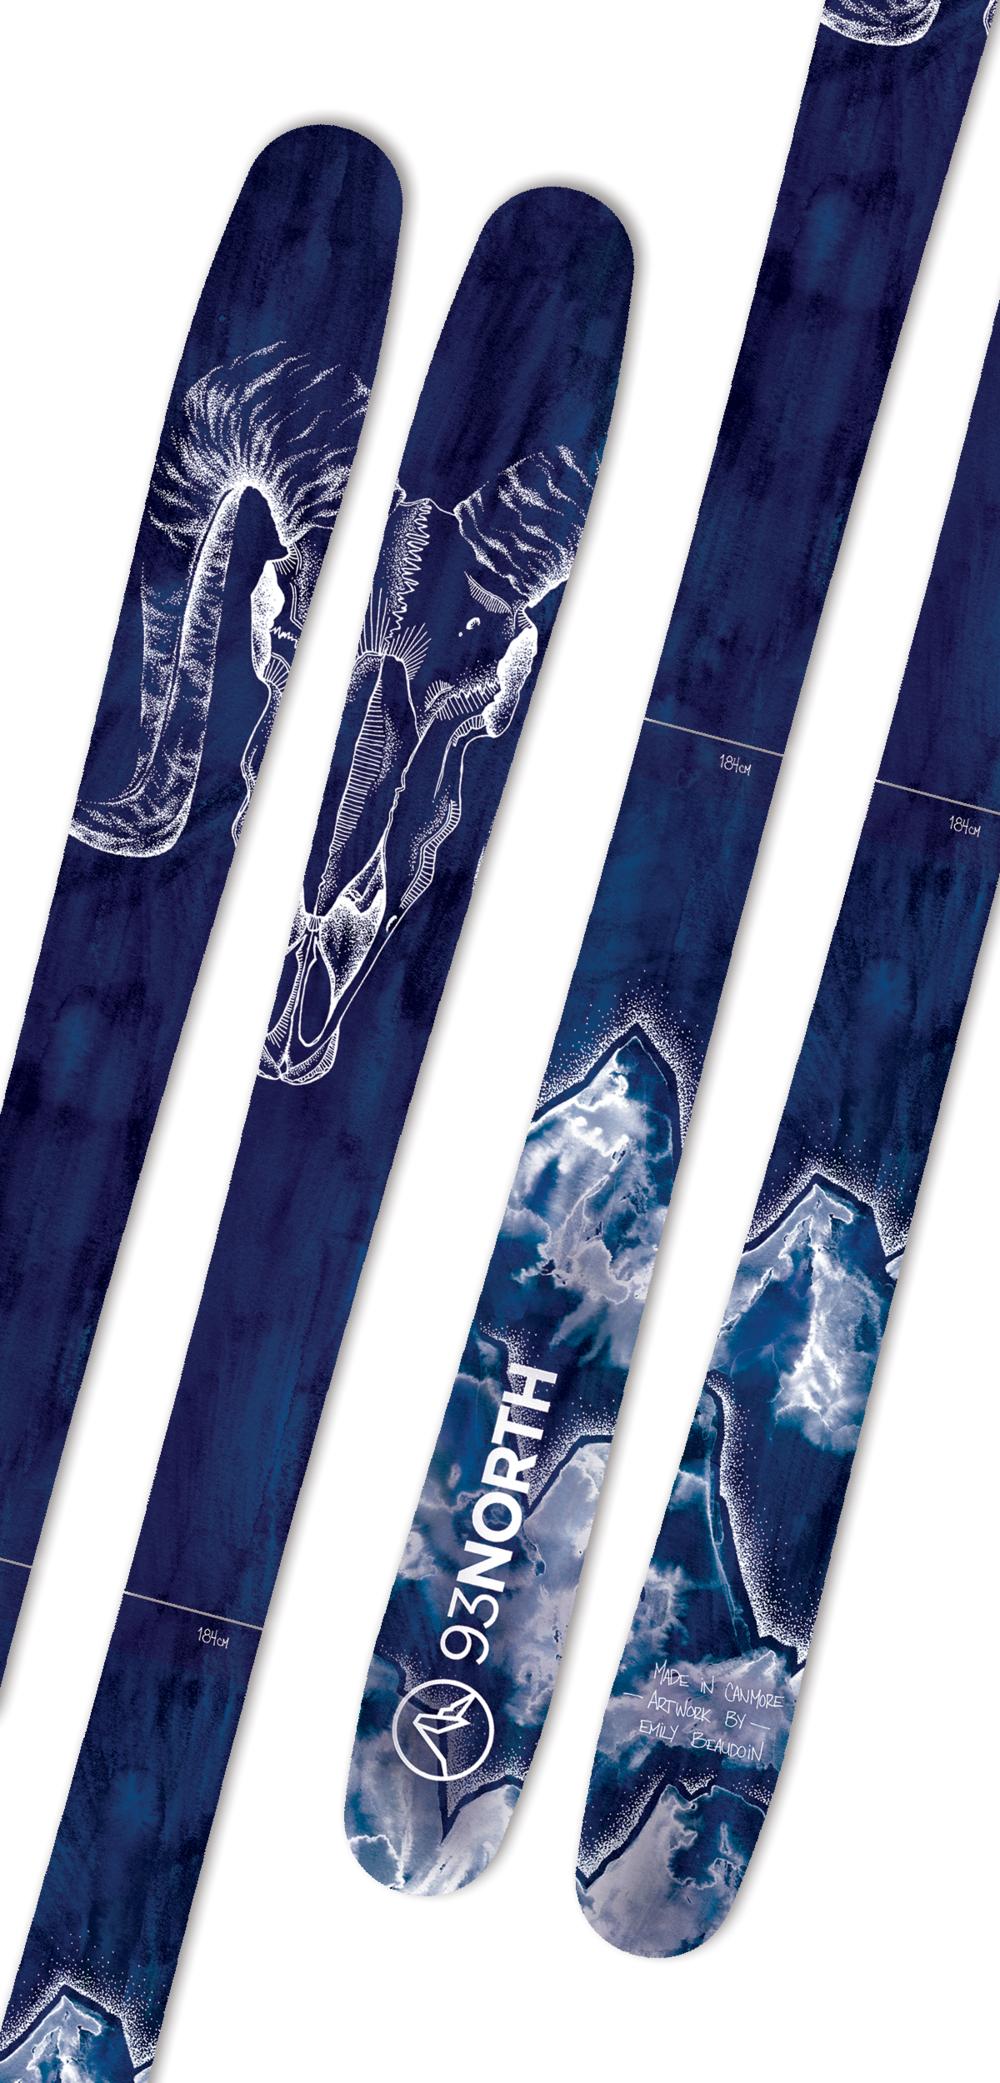 em-beaudoin-ski-topsheet-andromeda.png